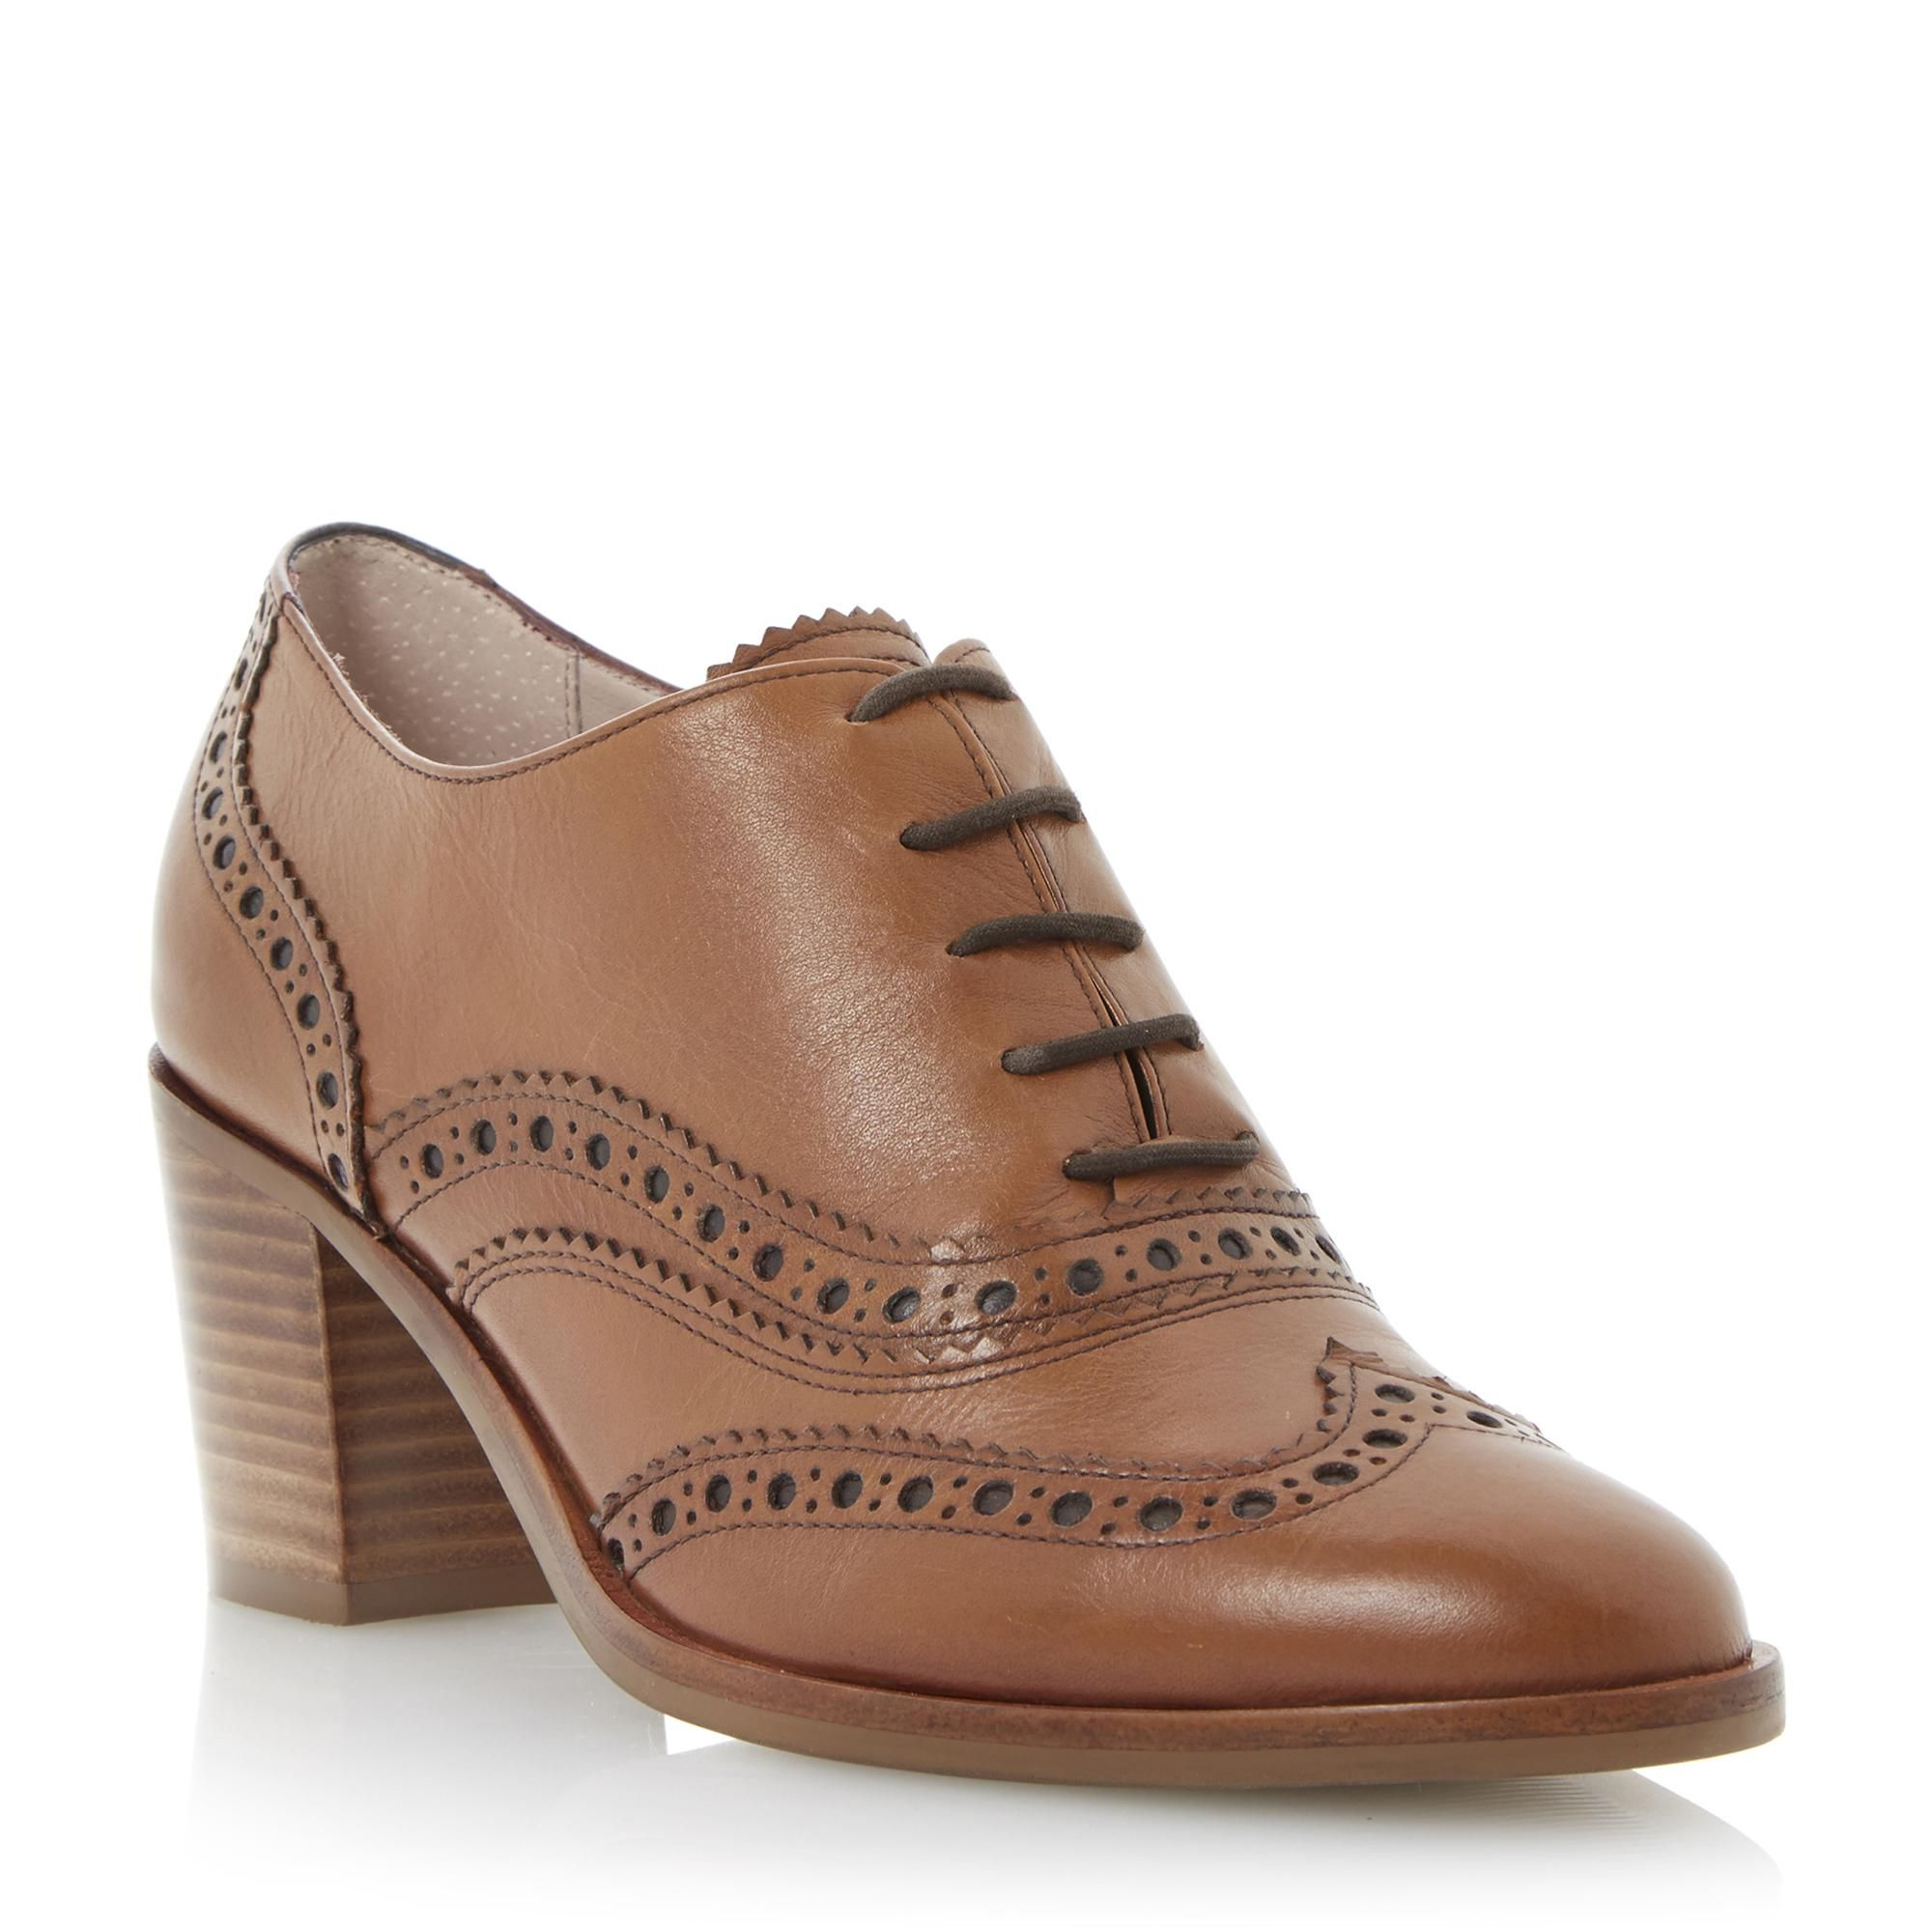 463dc8e2b03 DUNE LADIES LACIE - Block Heel Lace Up Leather Brogue - tan